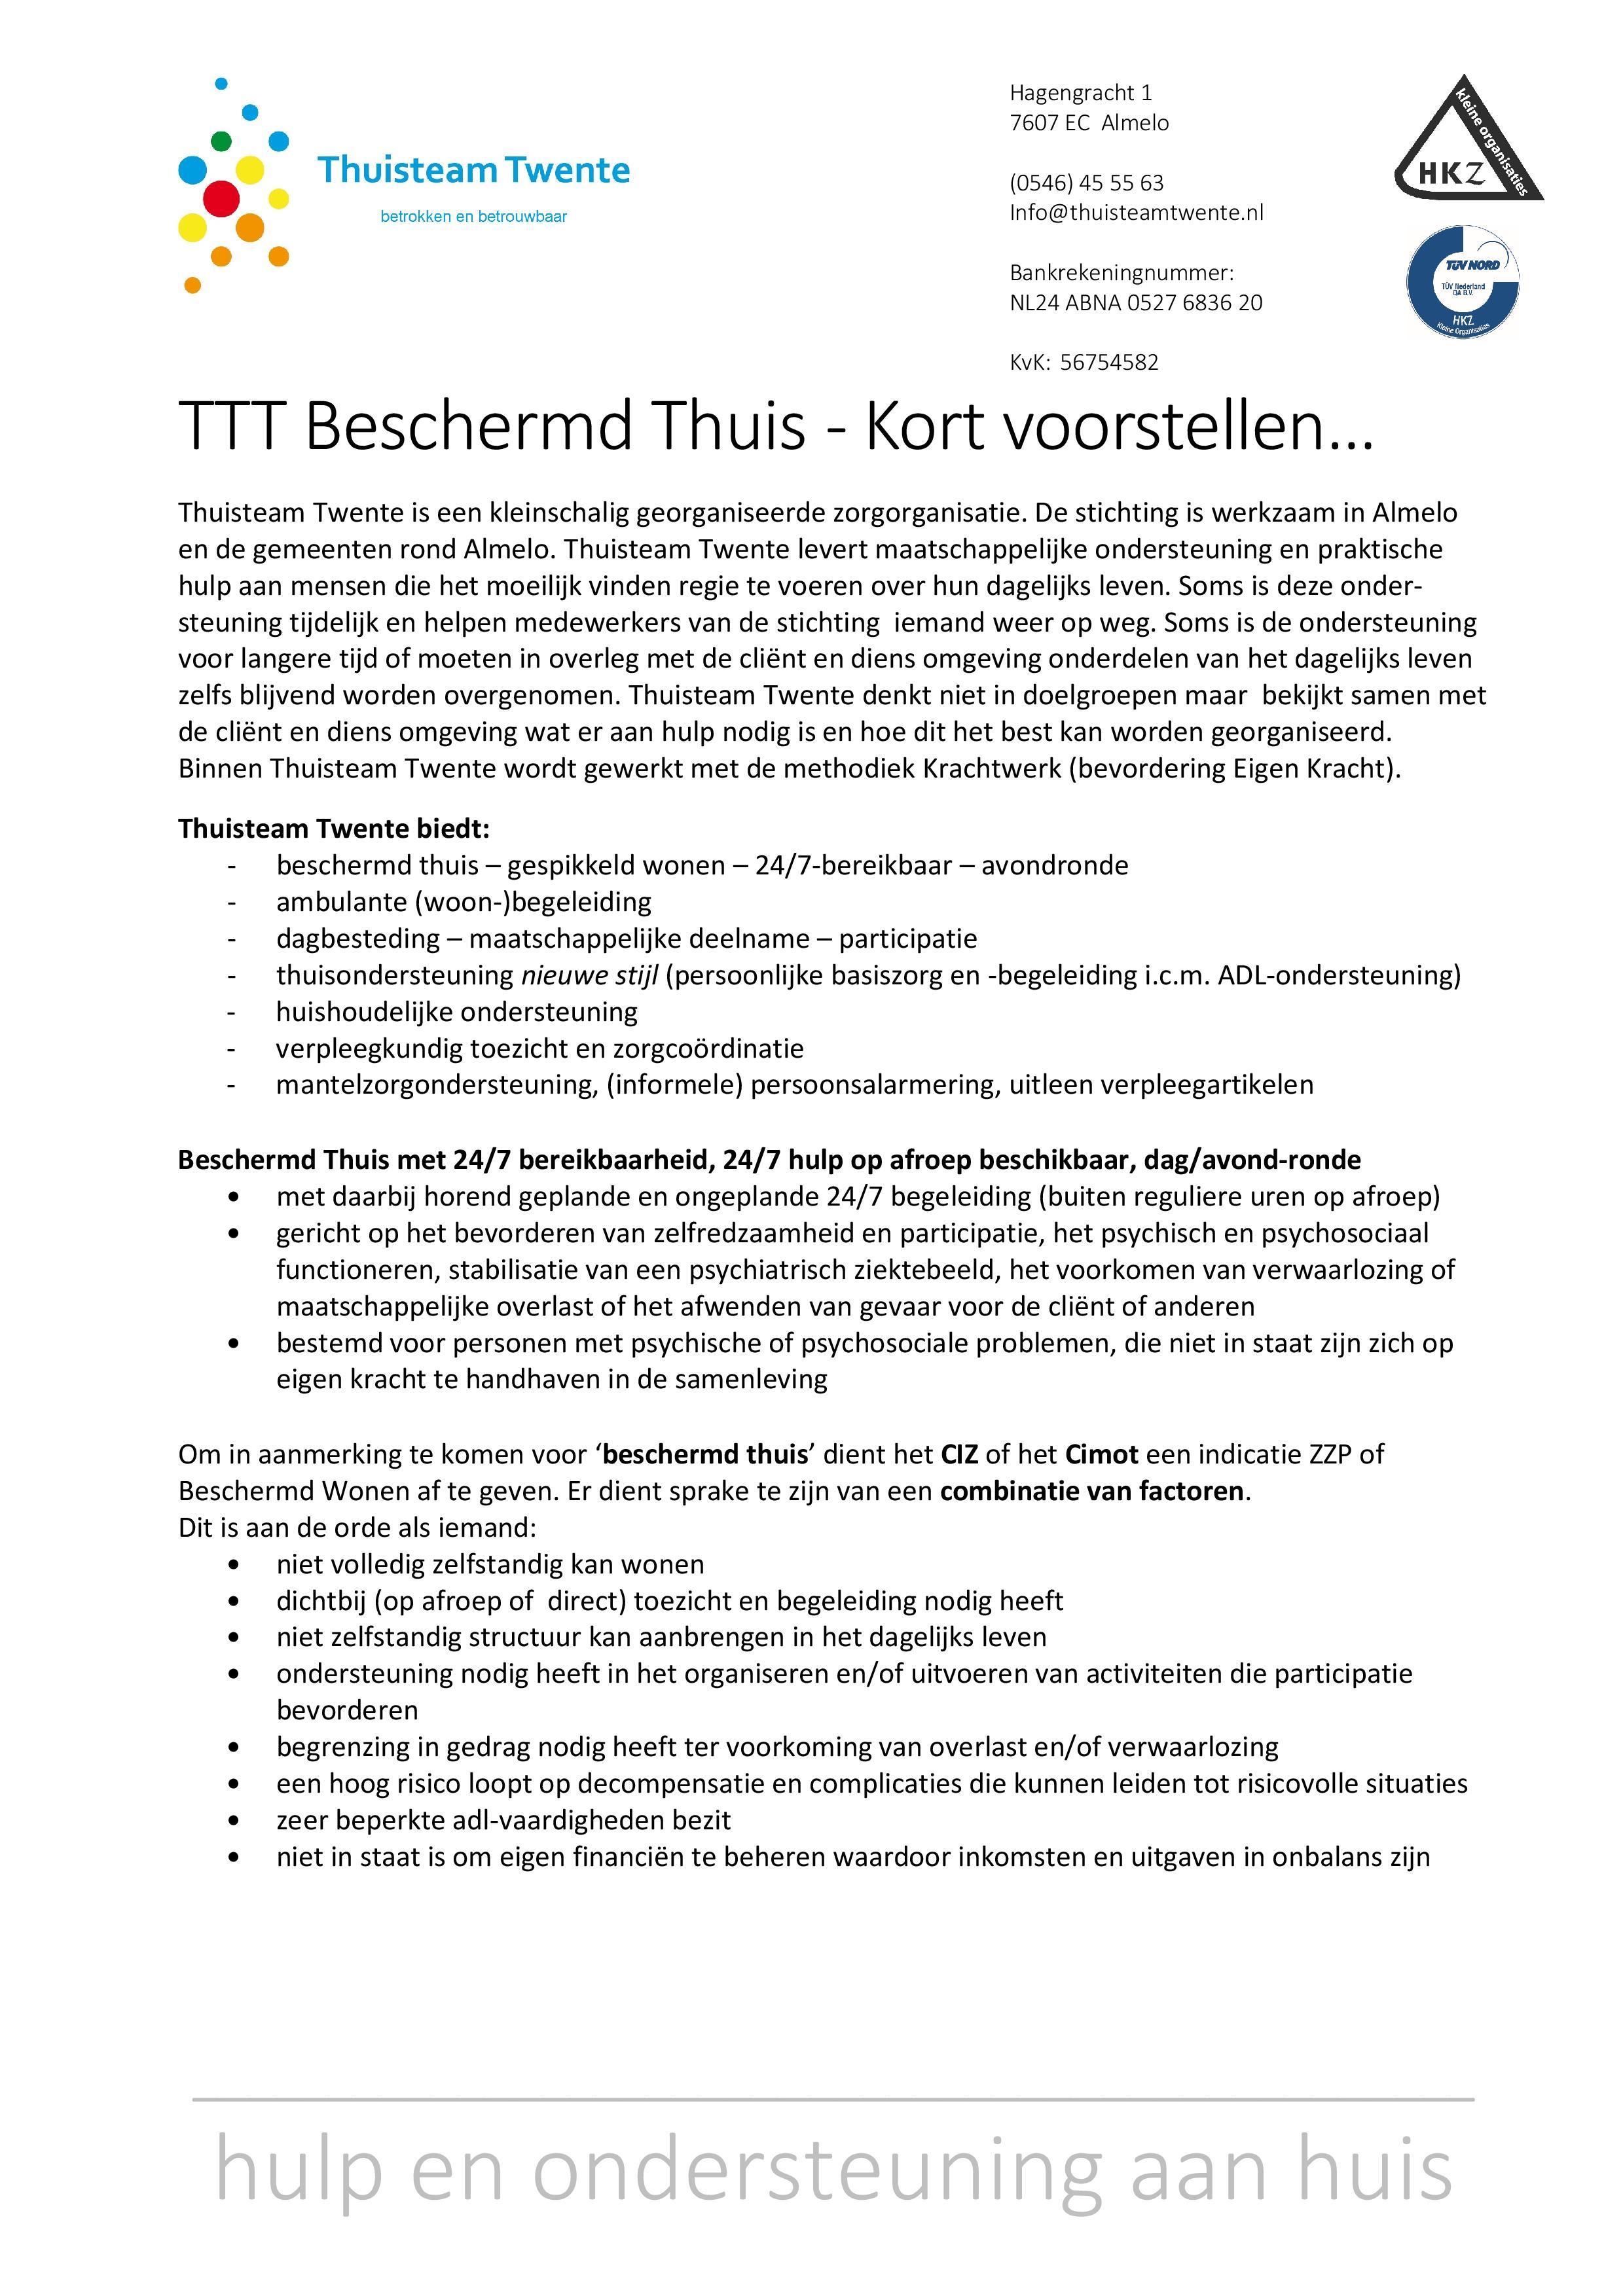 160000-algemene-informatie-over-ttt-beschermd-thuis-page-001